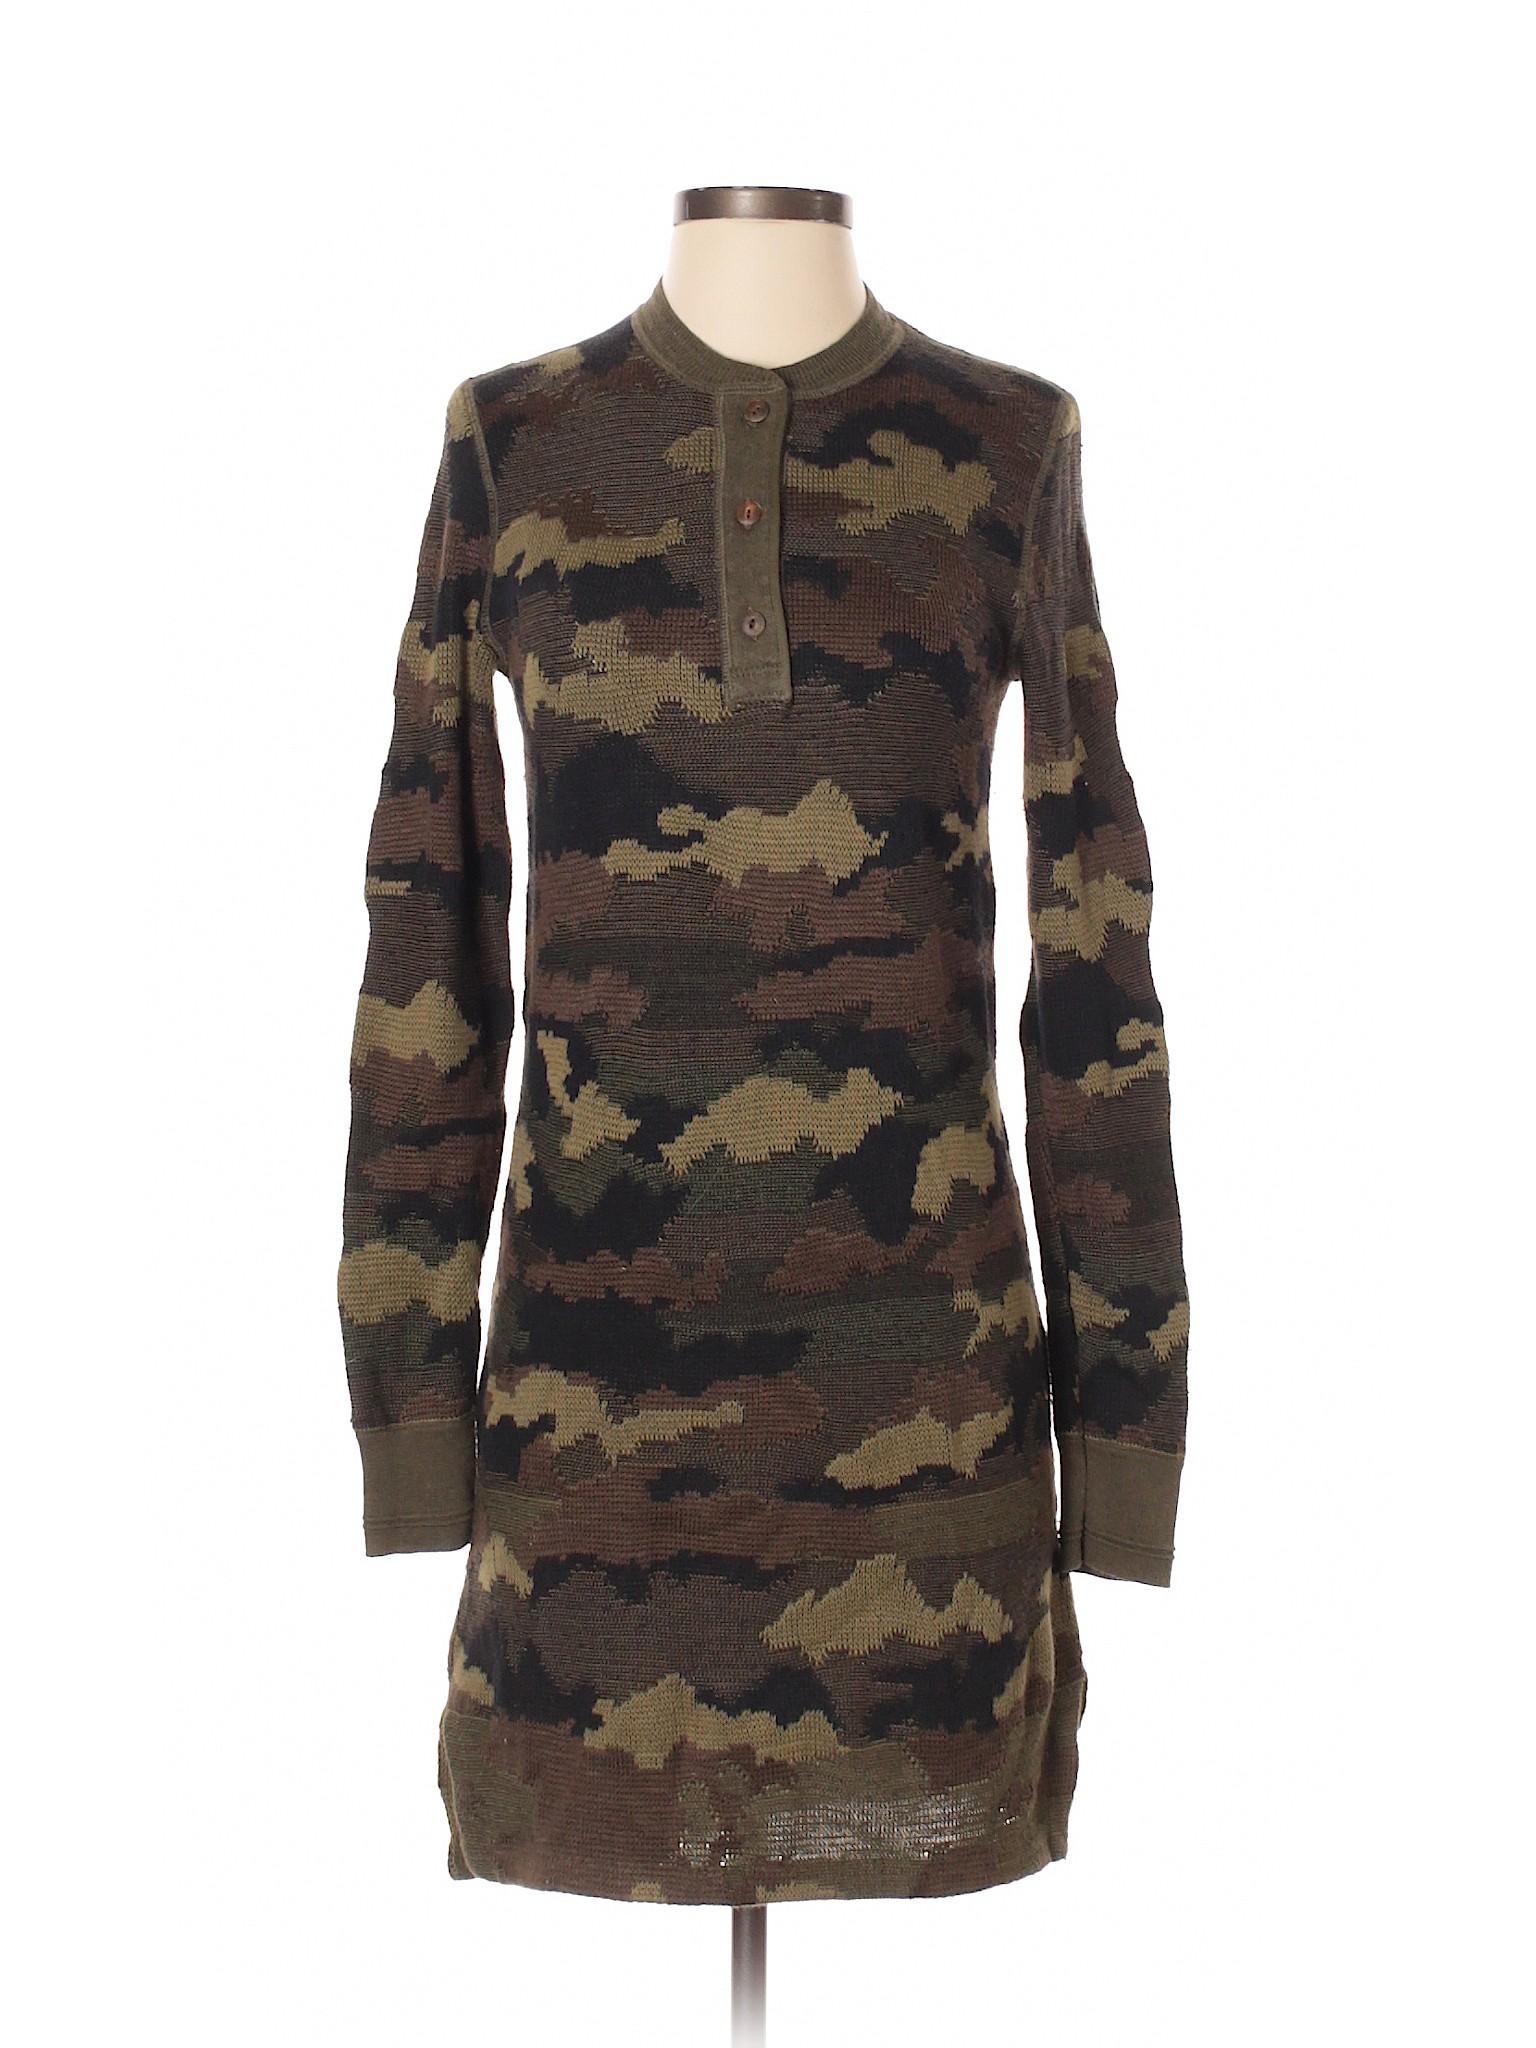 Boutique Casual Ralph winter Lauren Dress wOYX1TnvYq